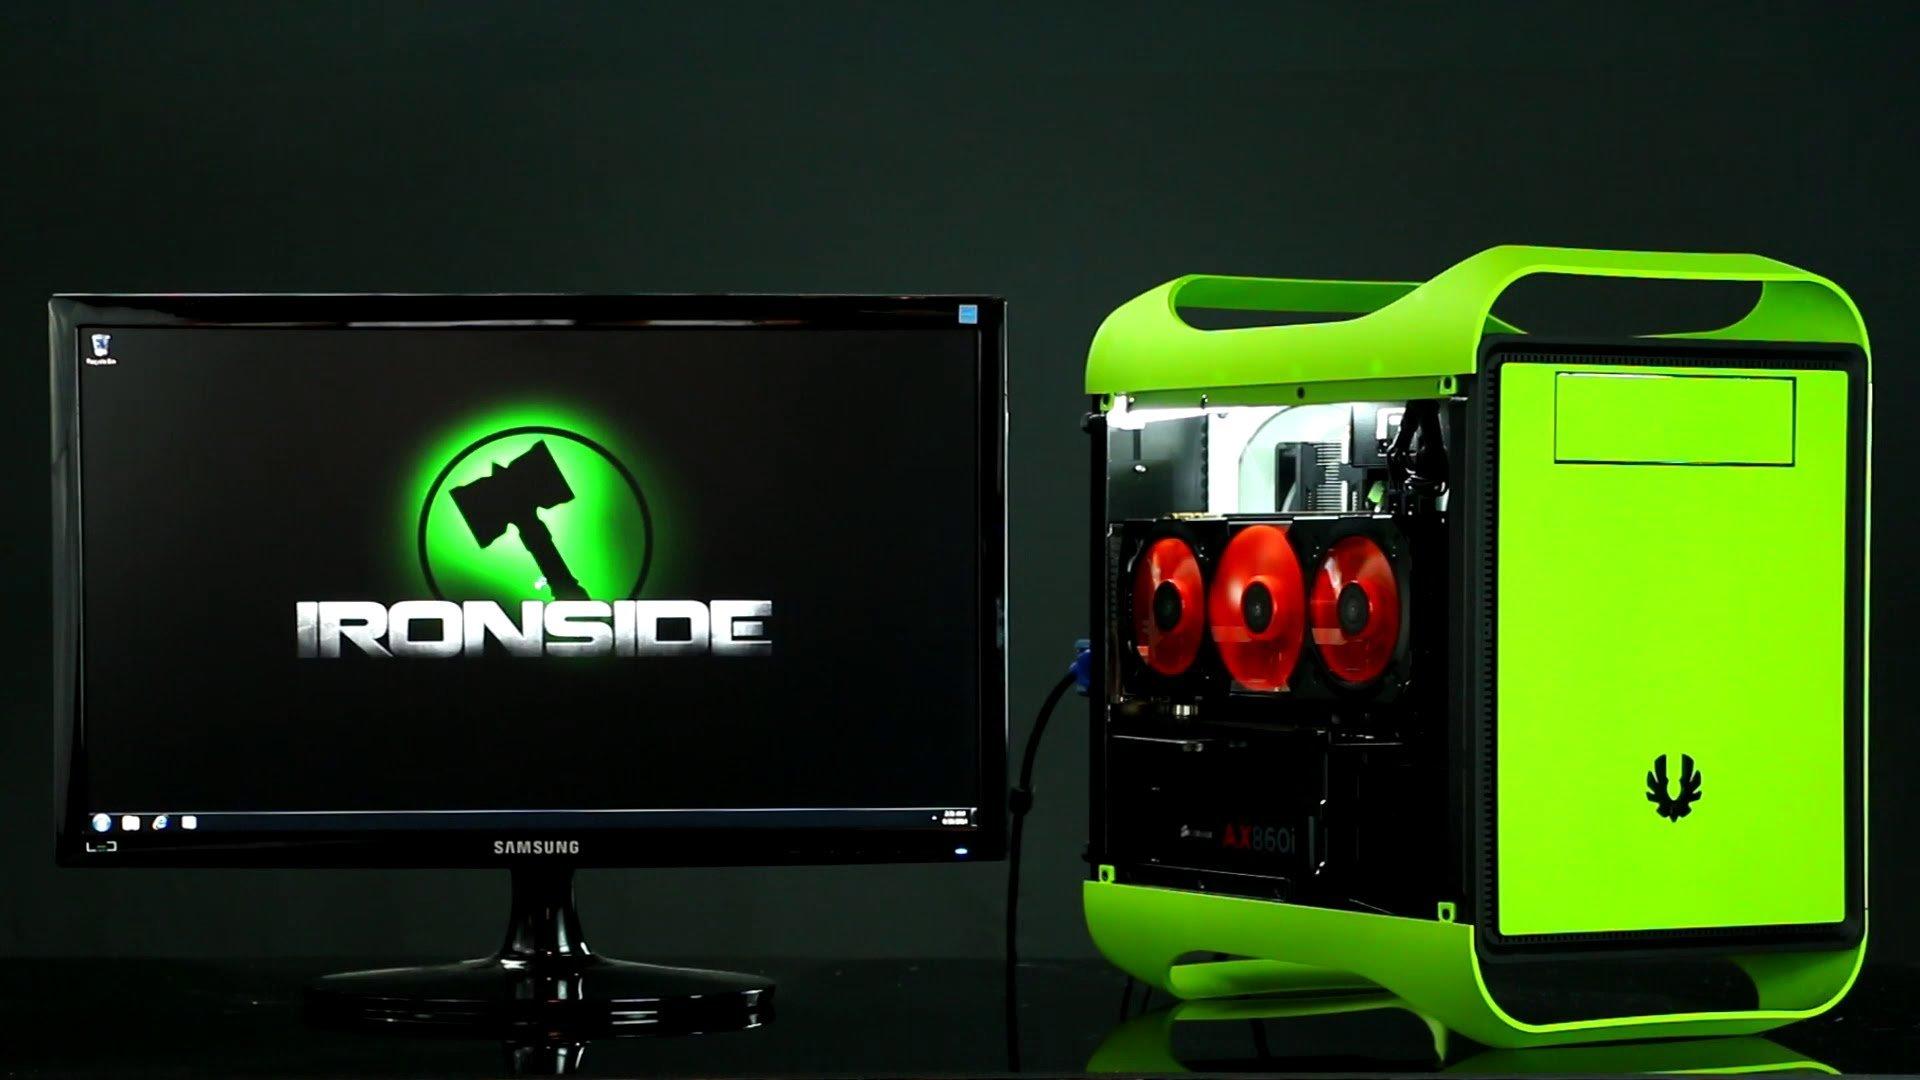 Ironside Gaming Computer Desktop Wallpaper 1920x1080 401275